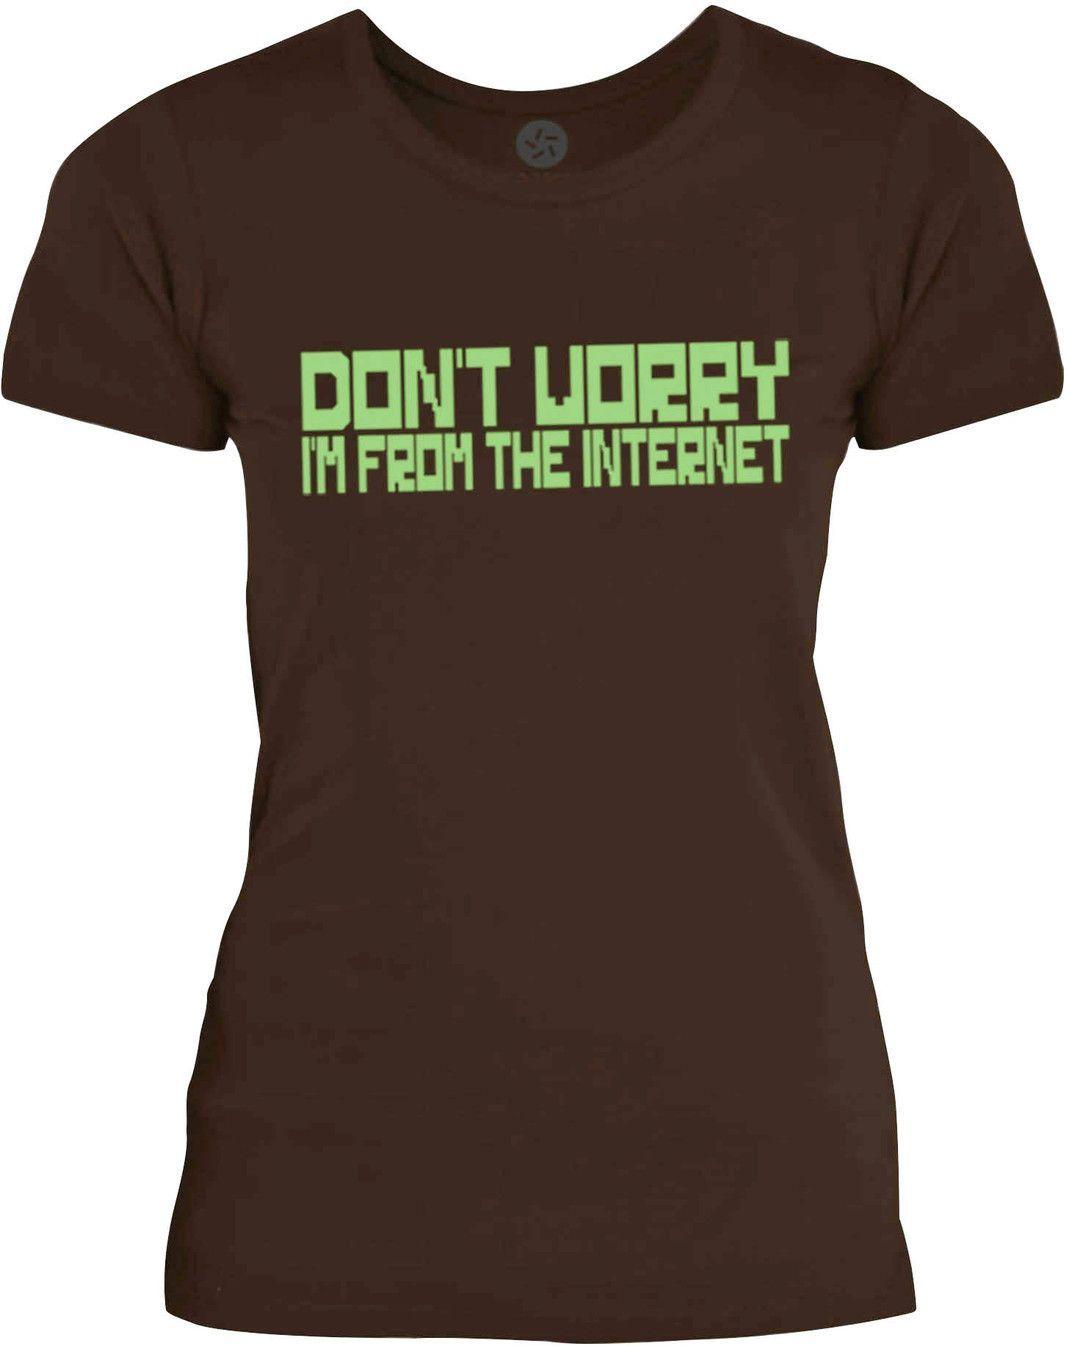 Big Texas Im From the Internet (Green) Womens Fine Jersey T-Shirt